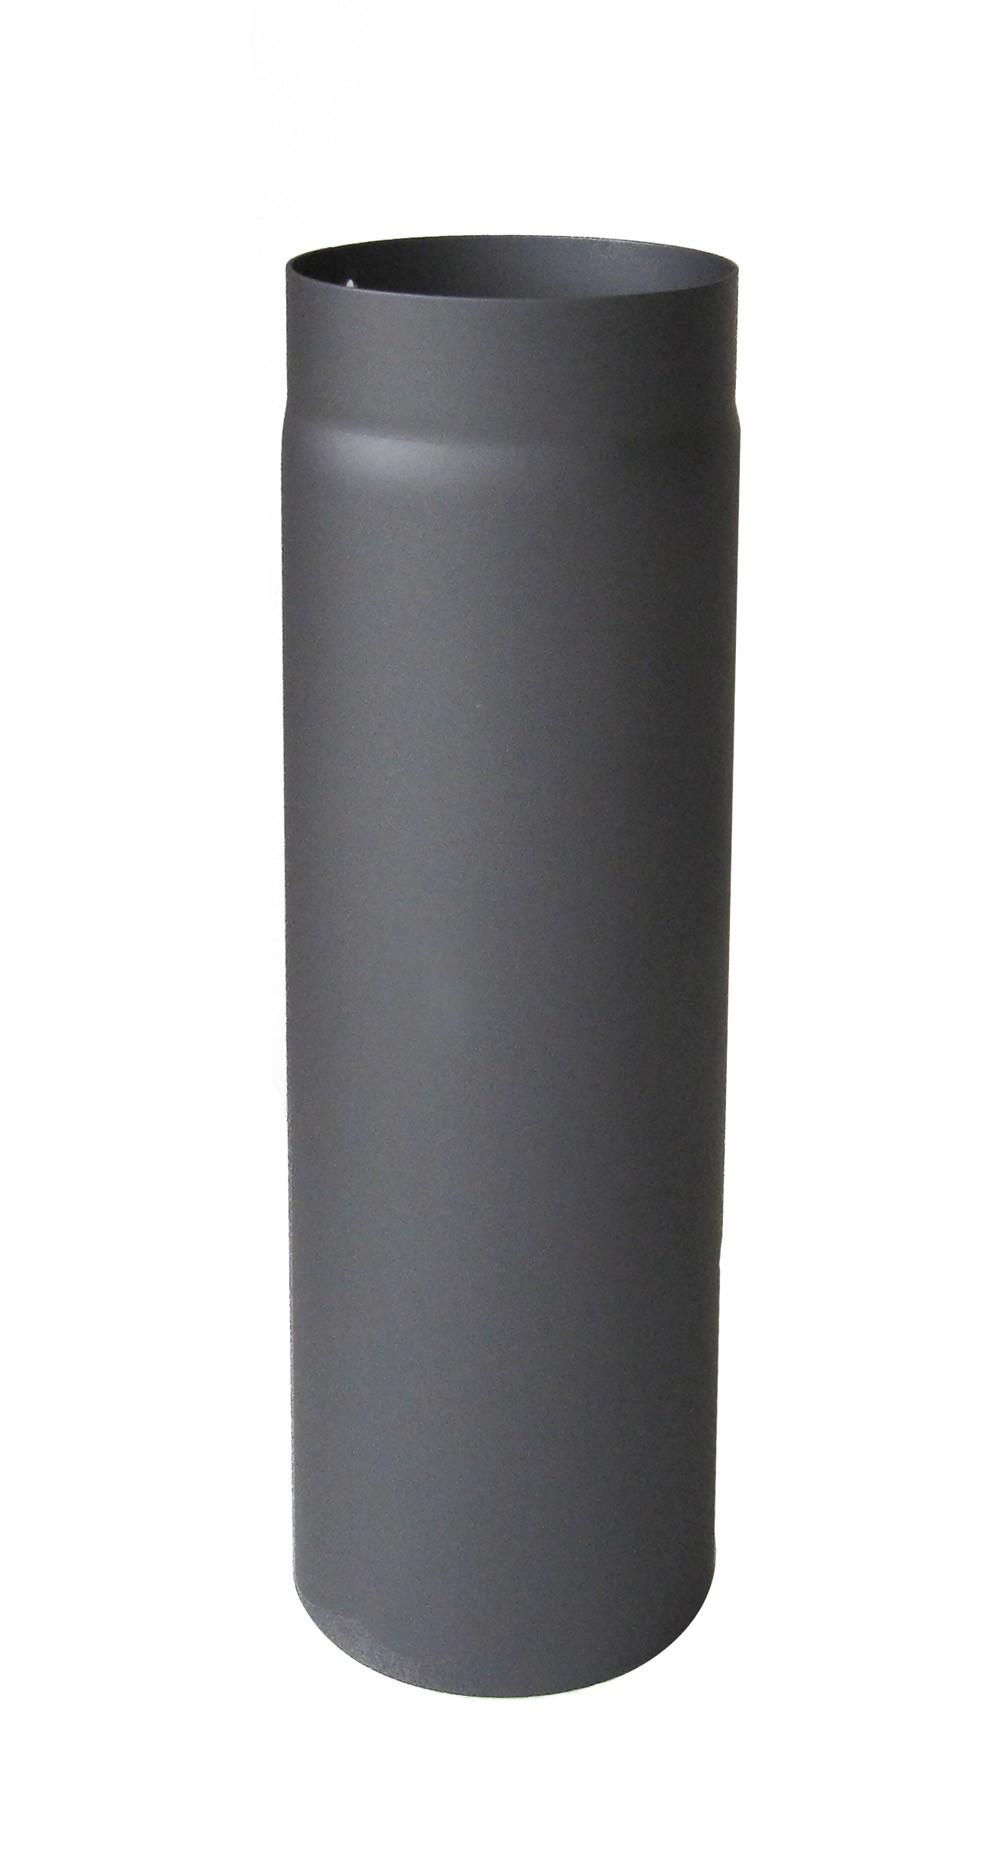 Ofenrohr / Rauchrohr Senotherm grau Ø120mm Länge 500 mm Bild 2